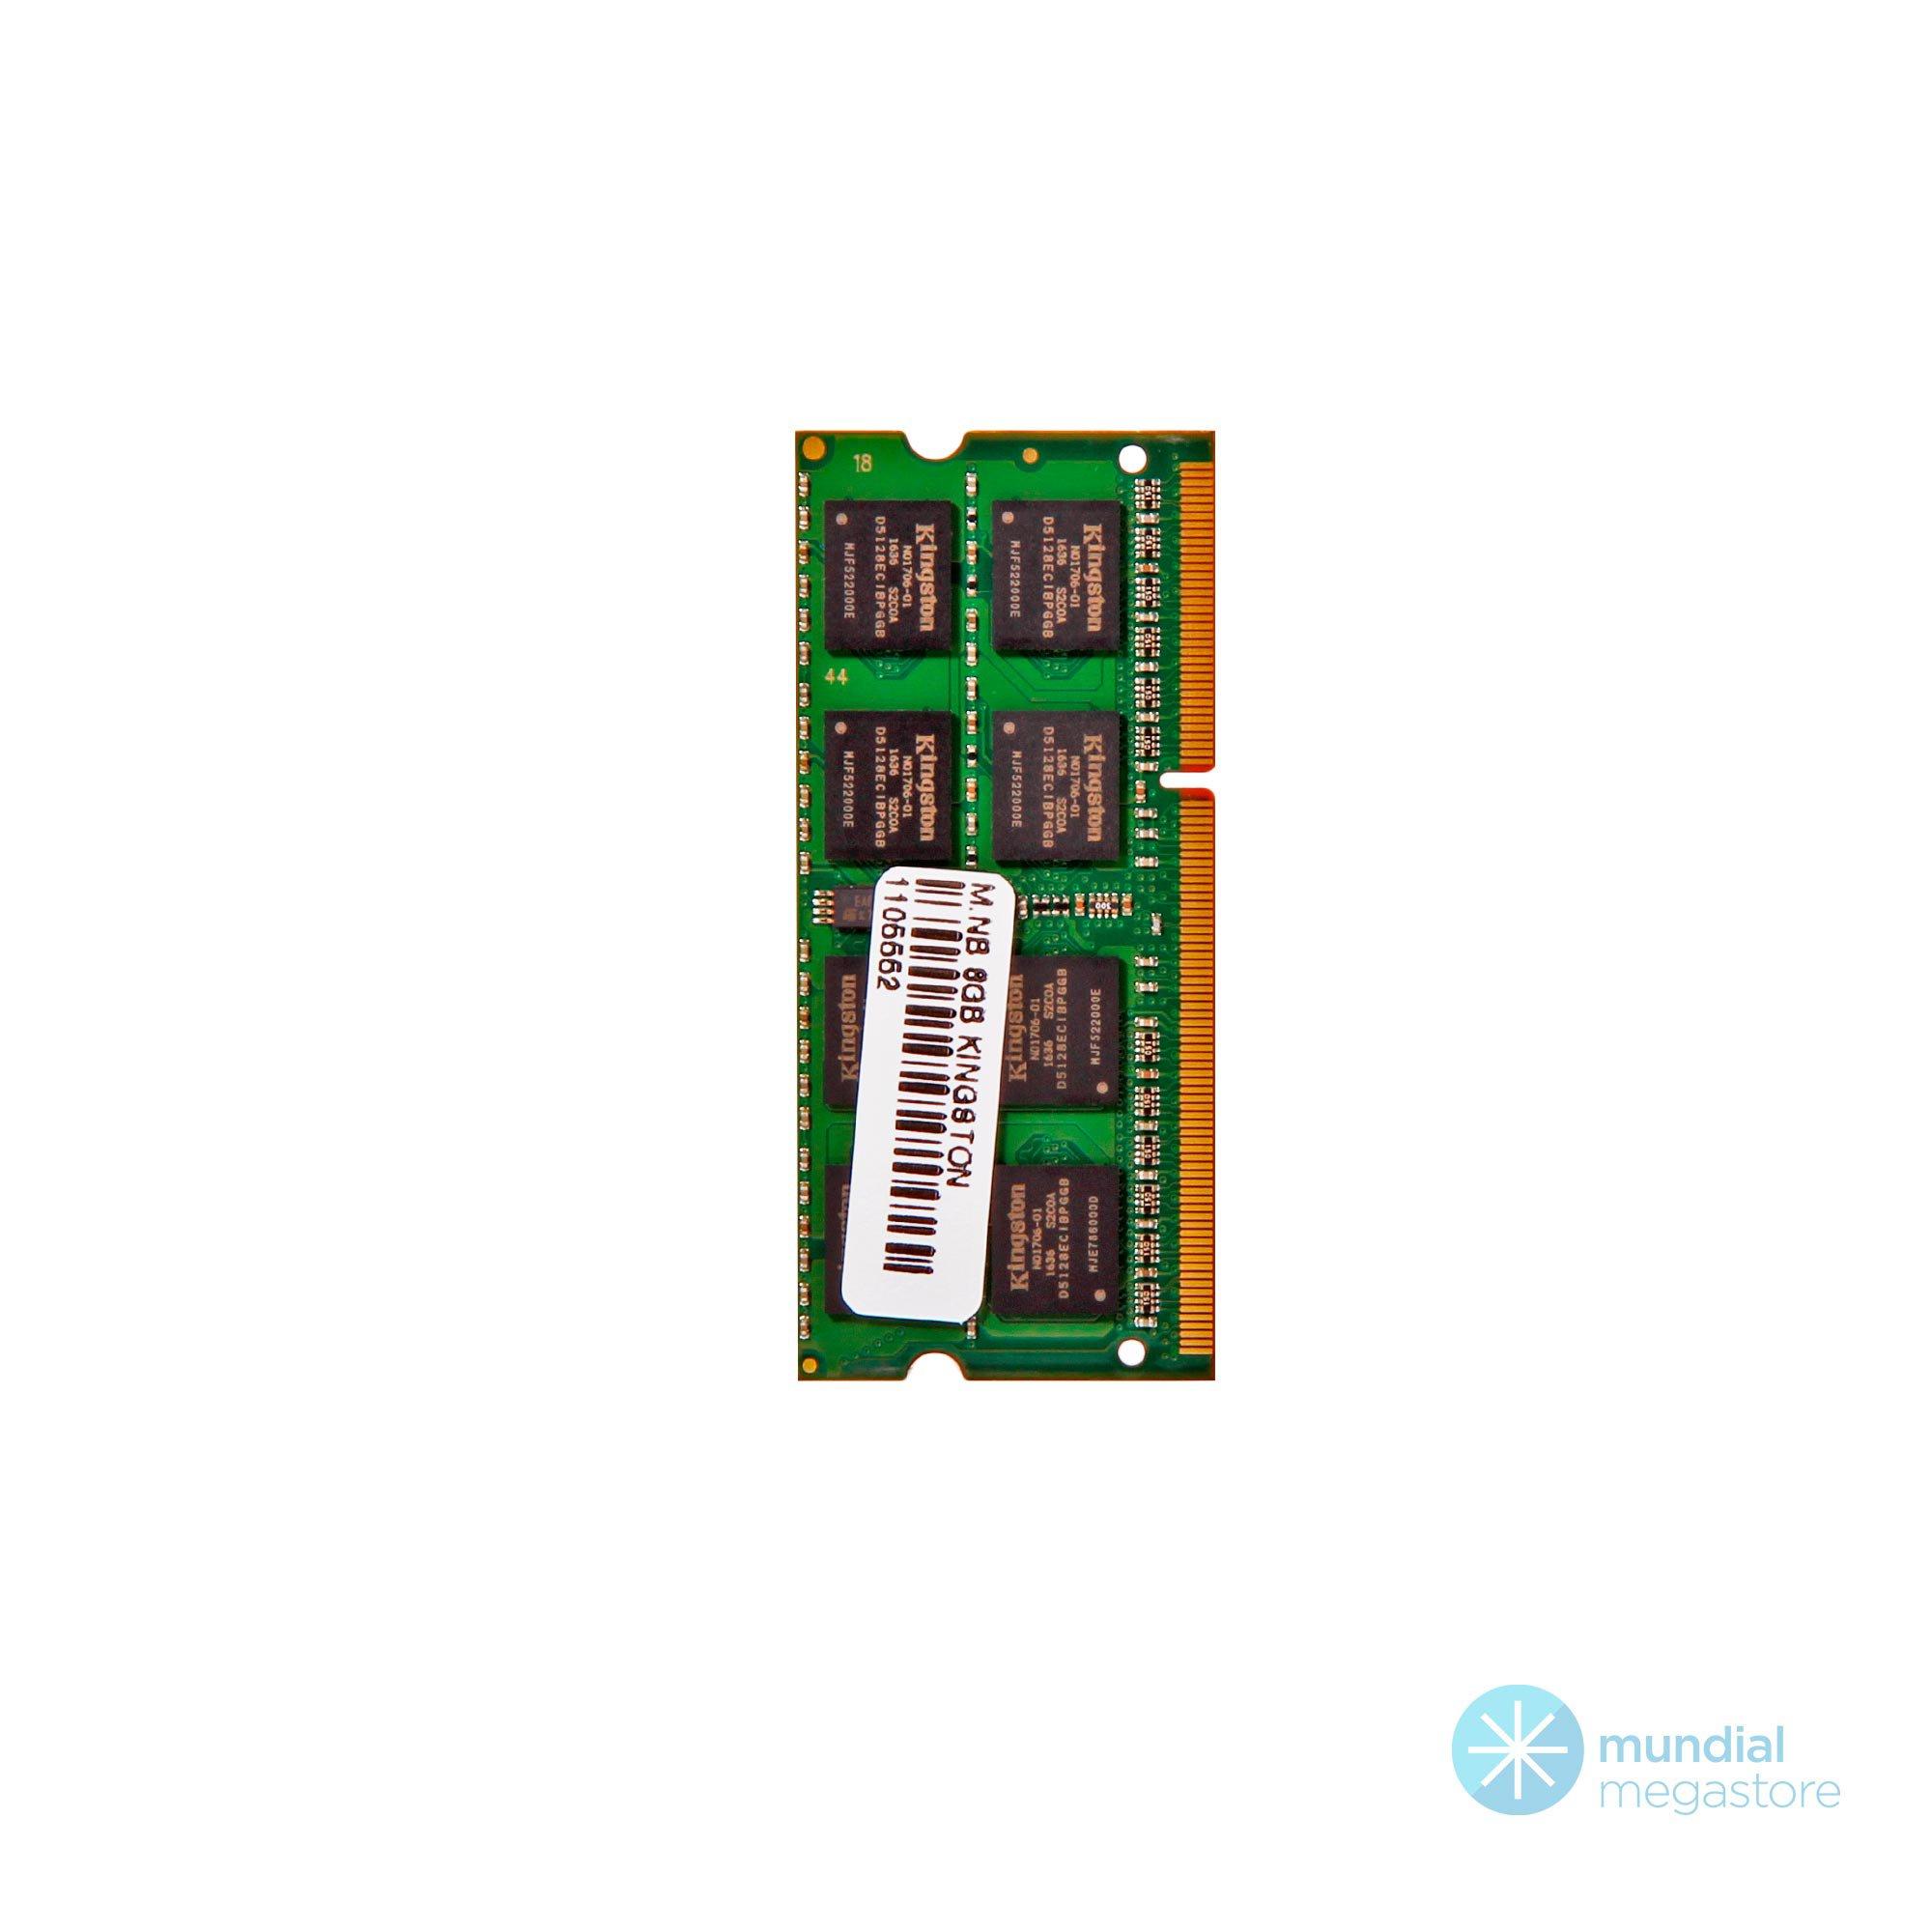 memoria notebook ddr3 8gb pc1333 kingston kvr133d3s9 8 21402 2000 196405